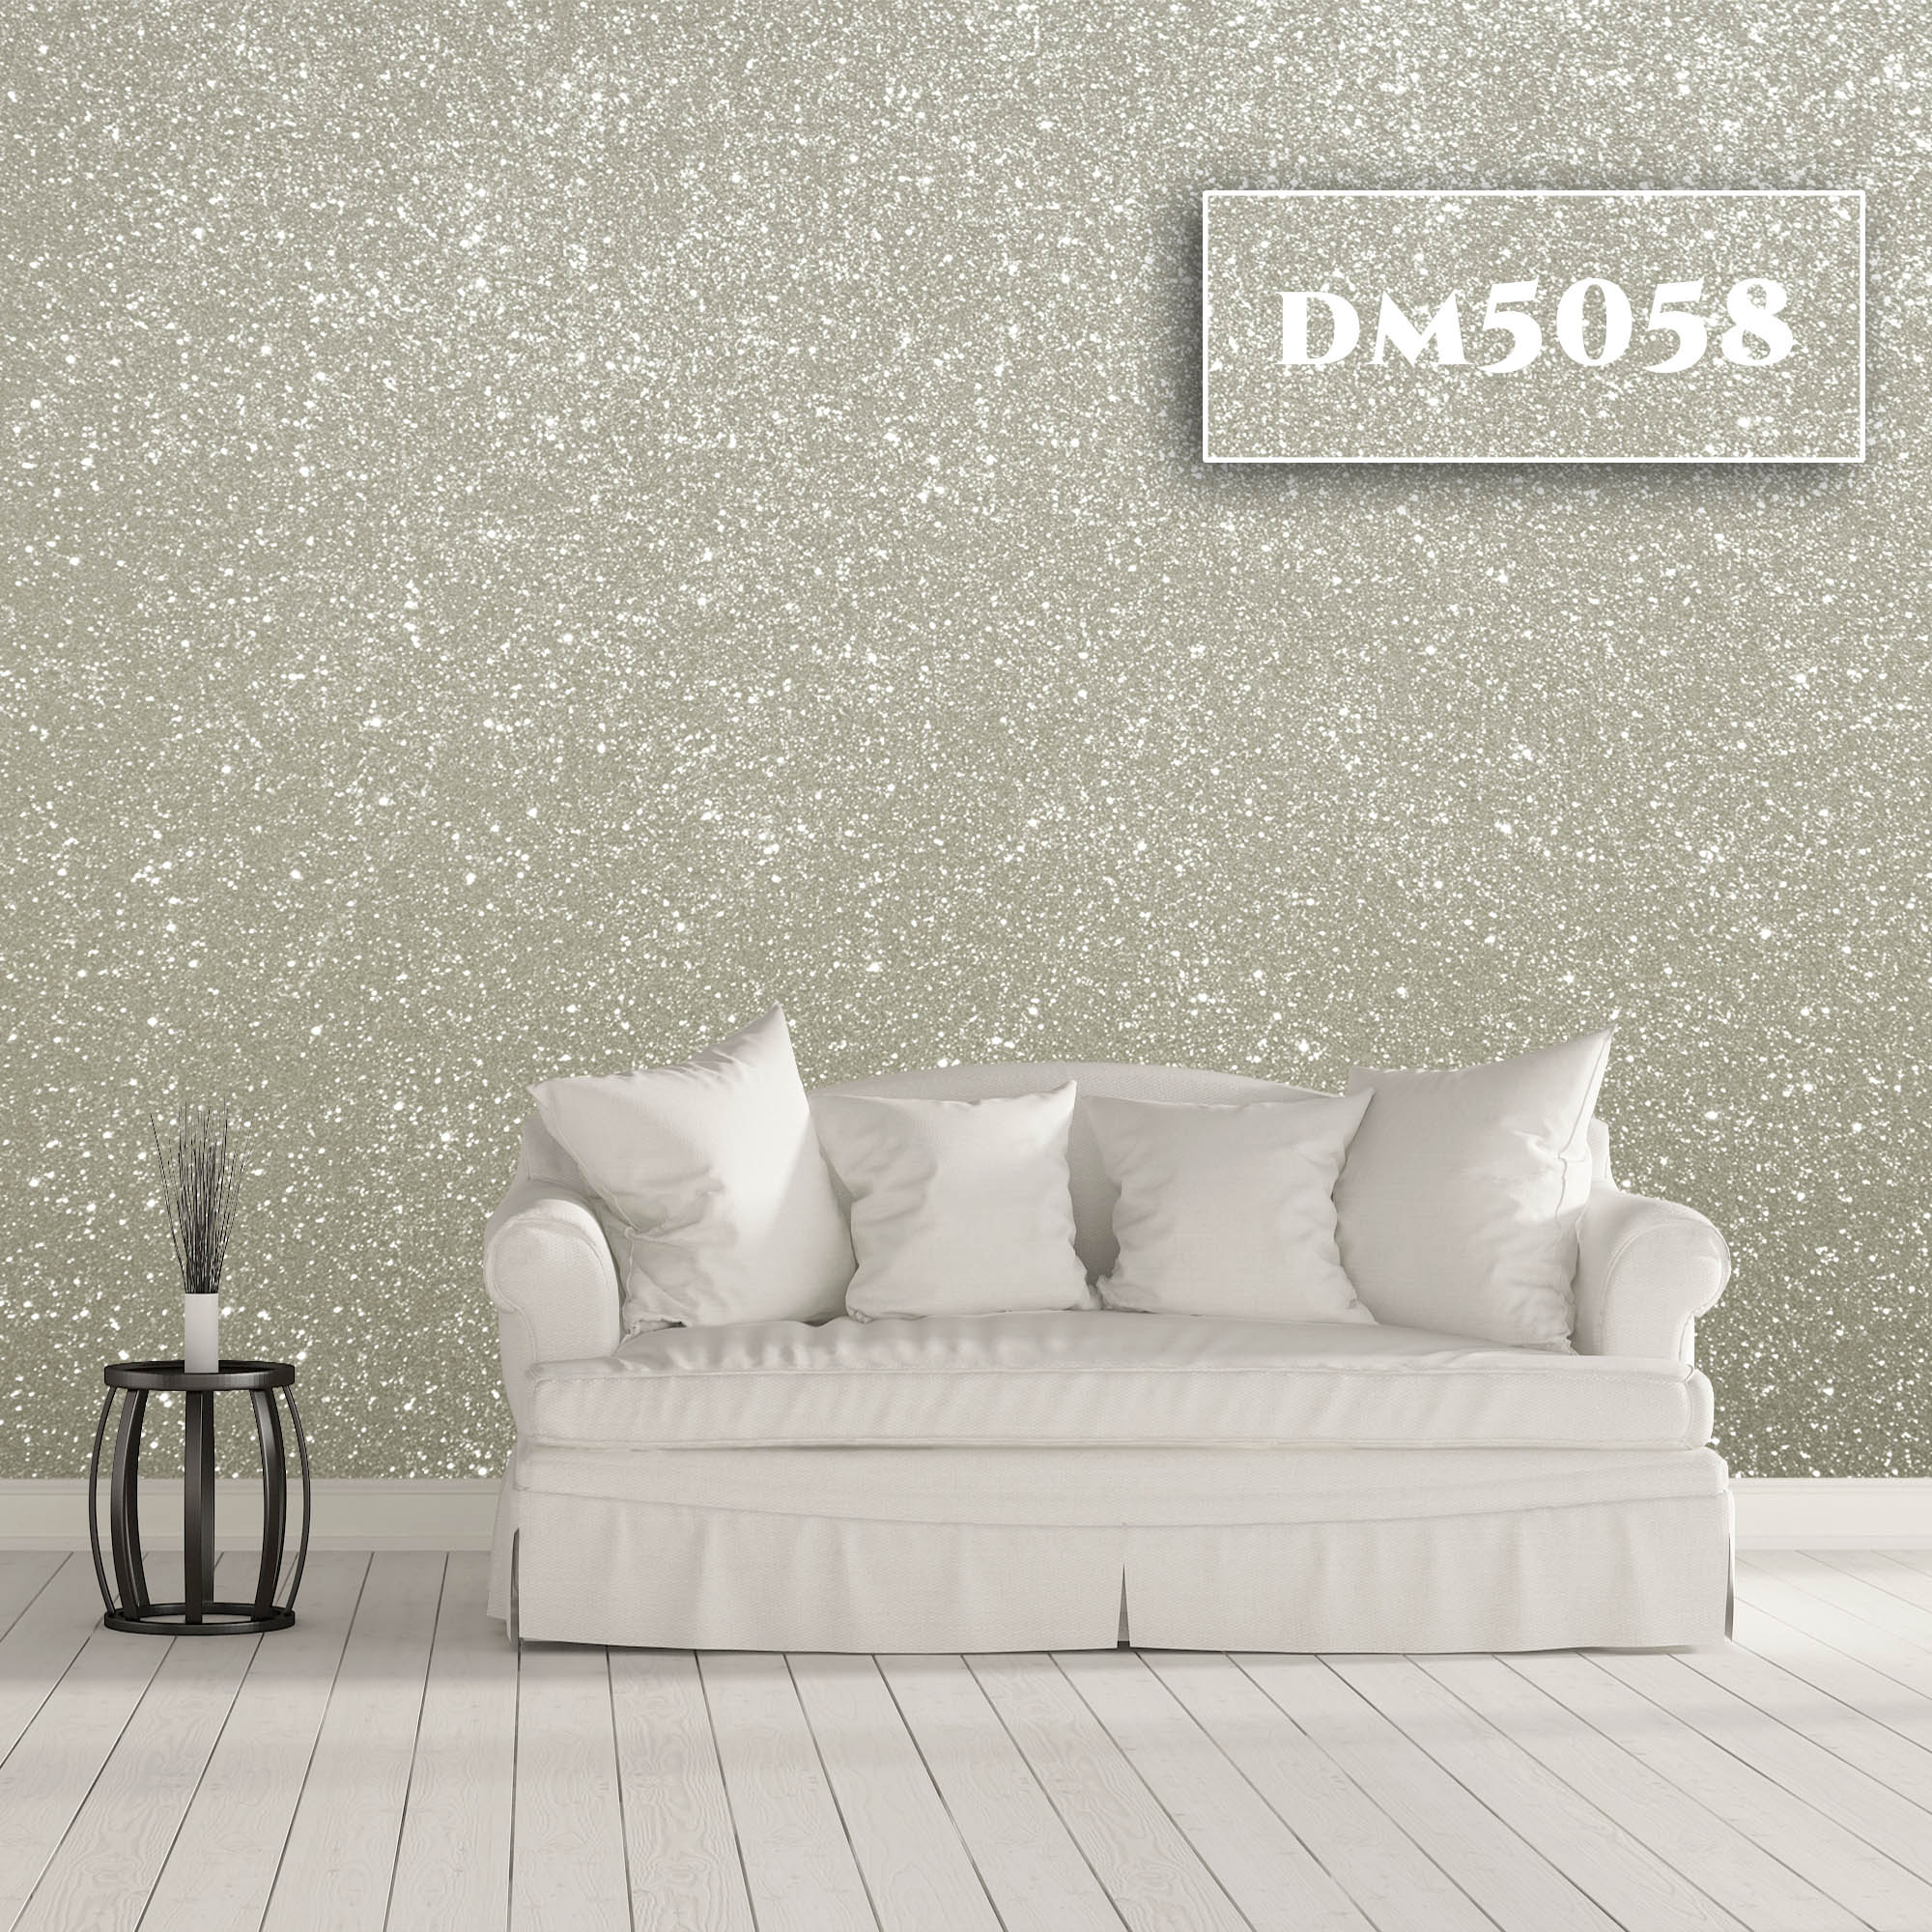 DM5058